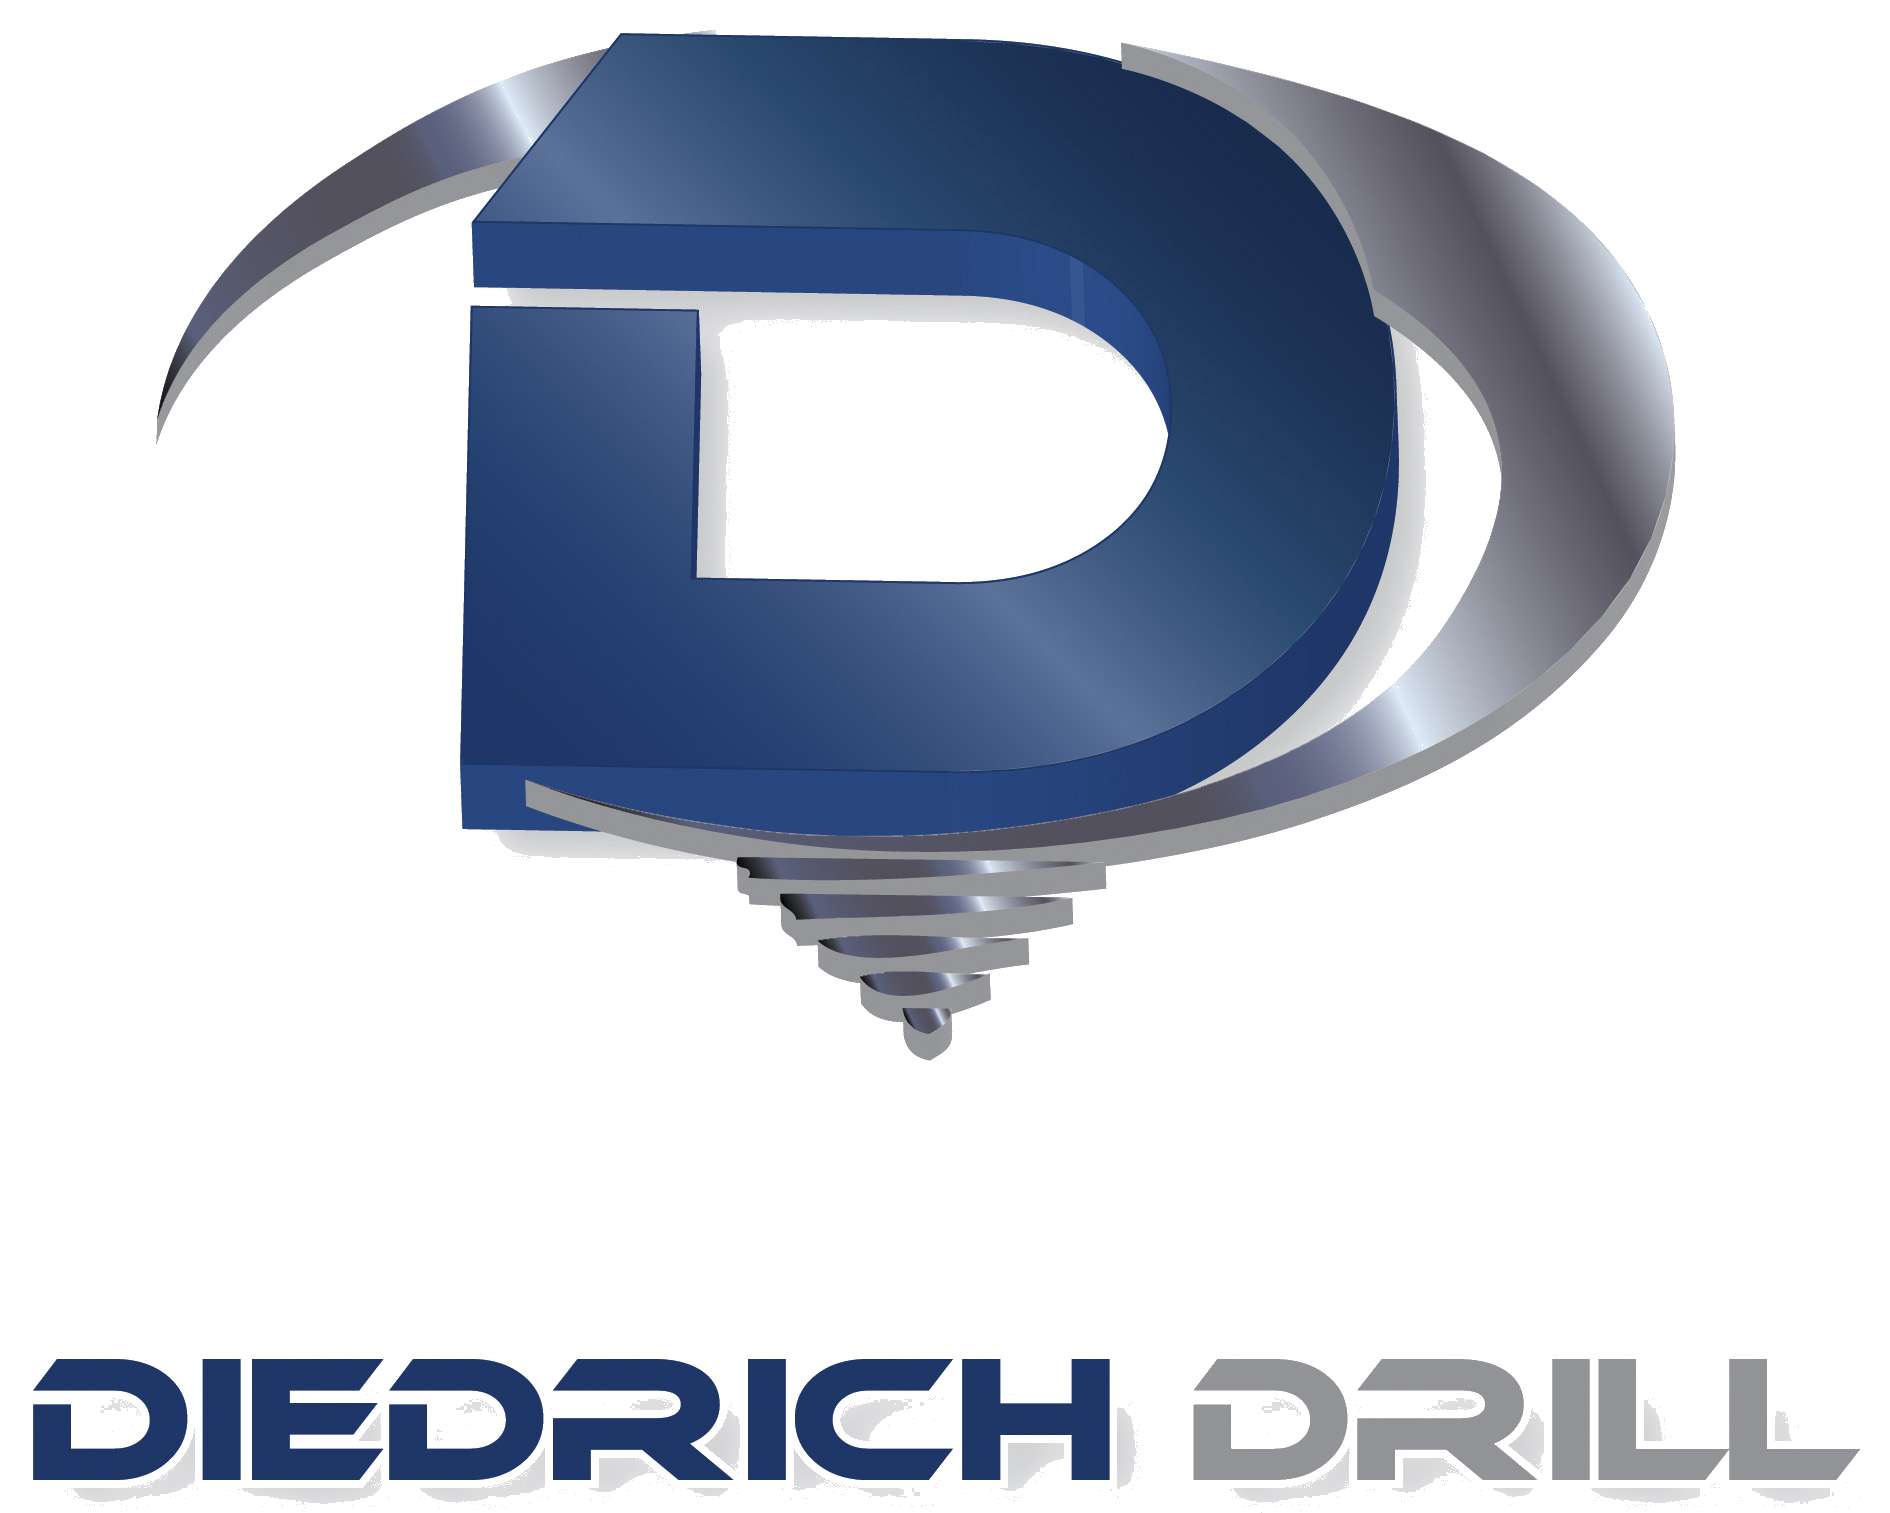 DiedrichDrillLOGO_FullColor3D new